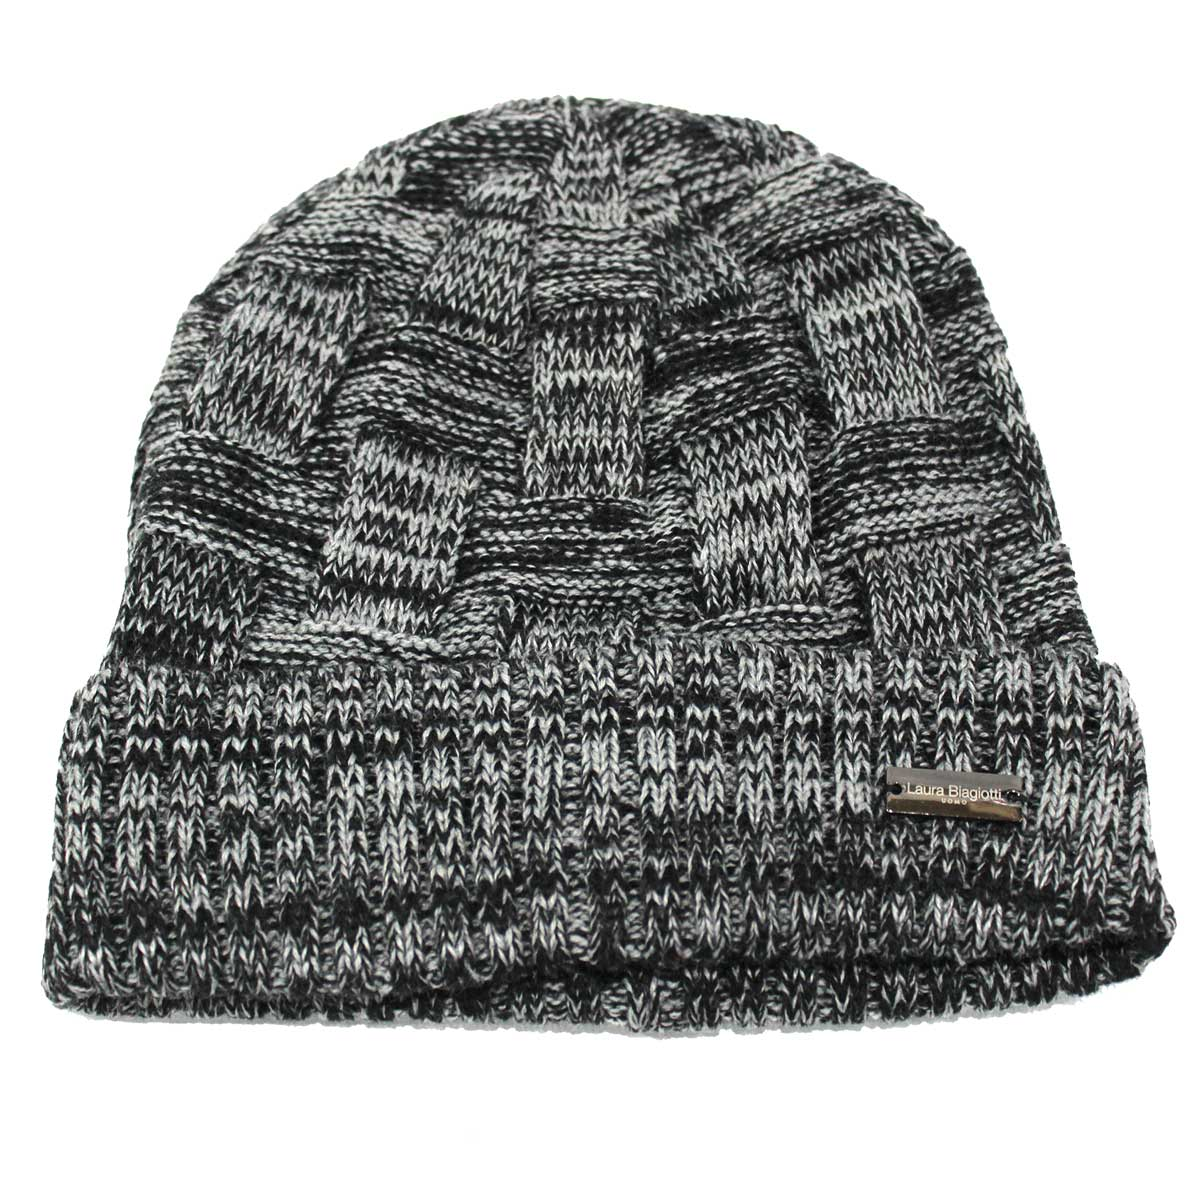 Men s hat 100% acrylic skipper model with headband cuff Laura Biagiotti  21371 black grey 52c7990f7cbf